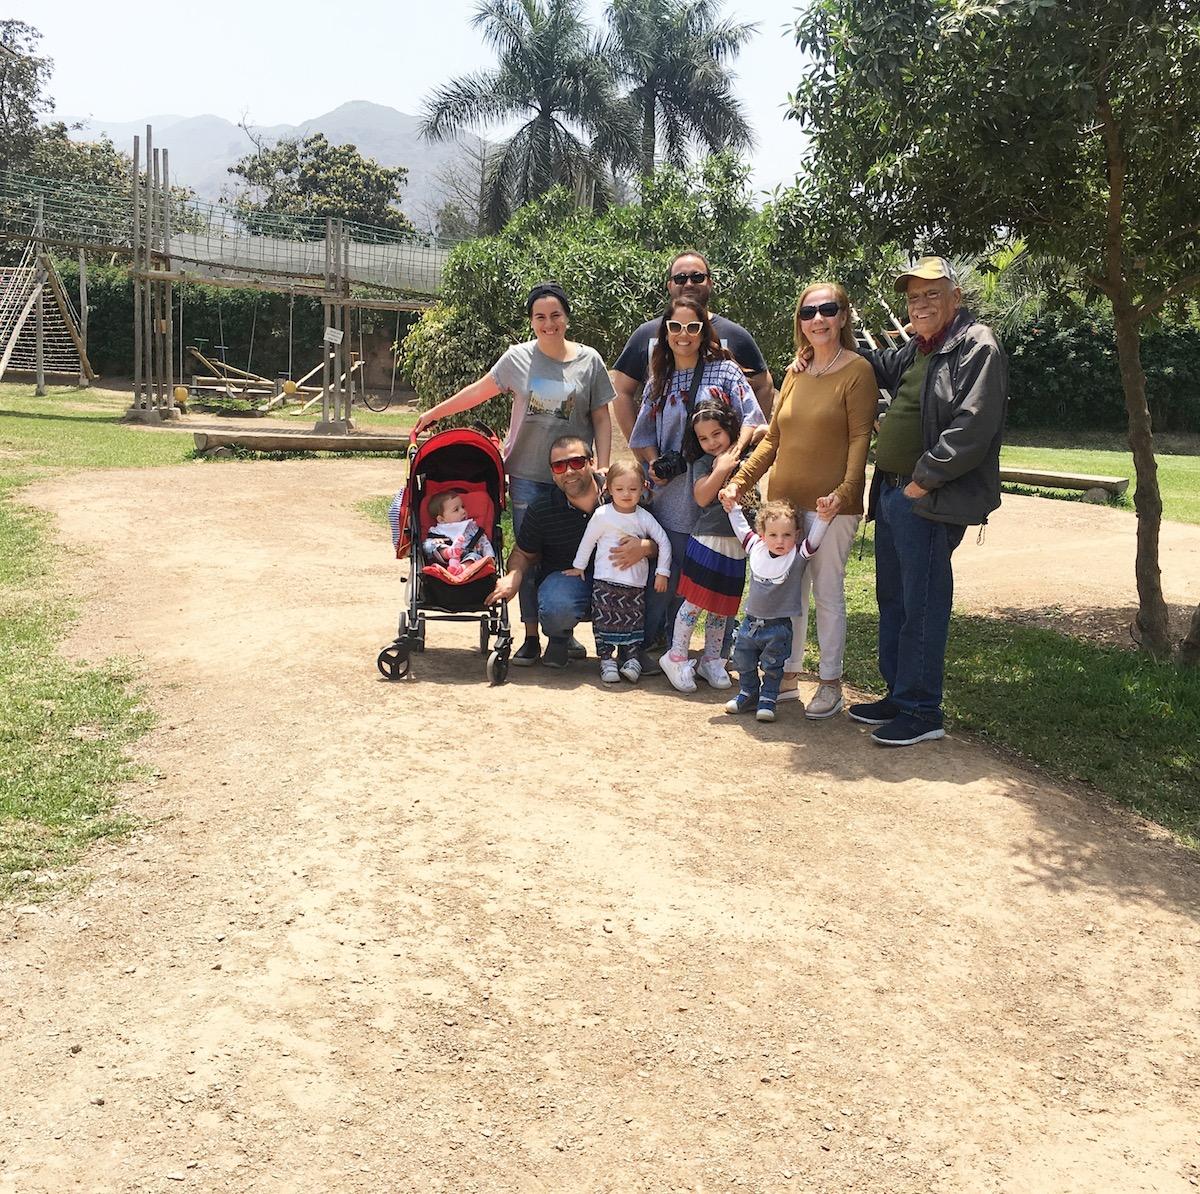 La vida de Serendipity - Mi familia - Chaxras